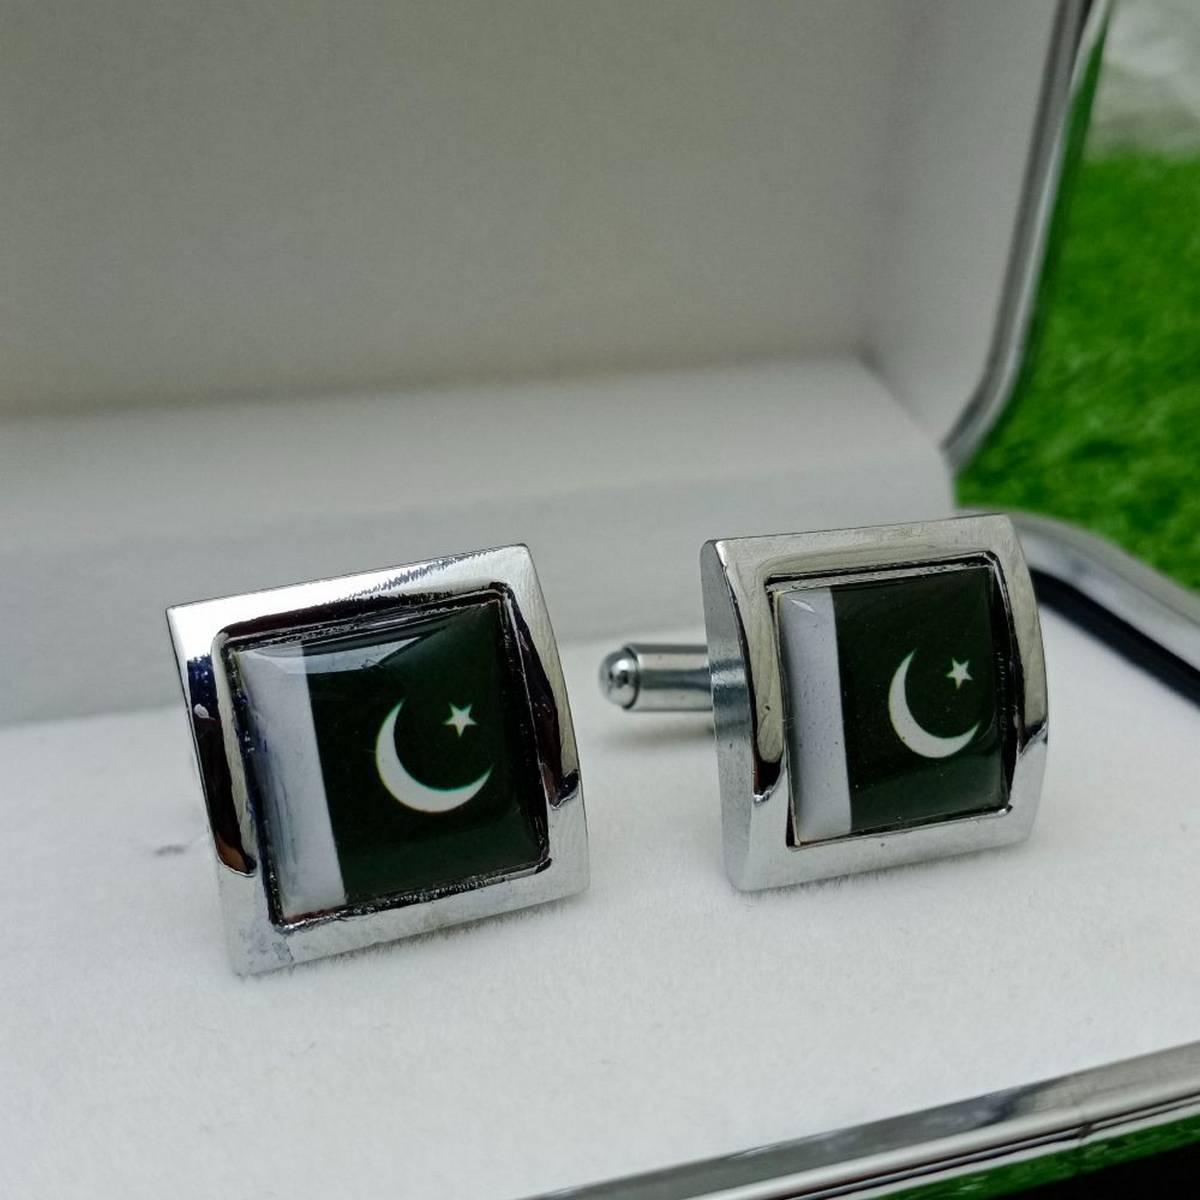 Pakistan Flag Design Cufflink For Men Studs Office Party & Casual Wear